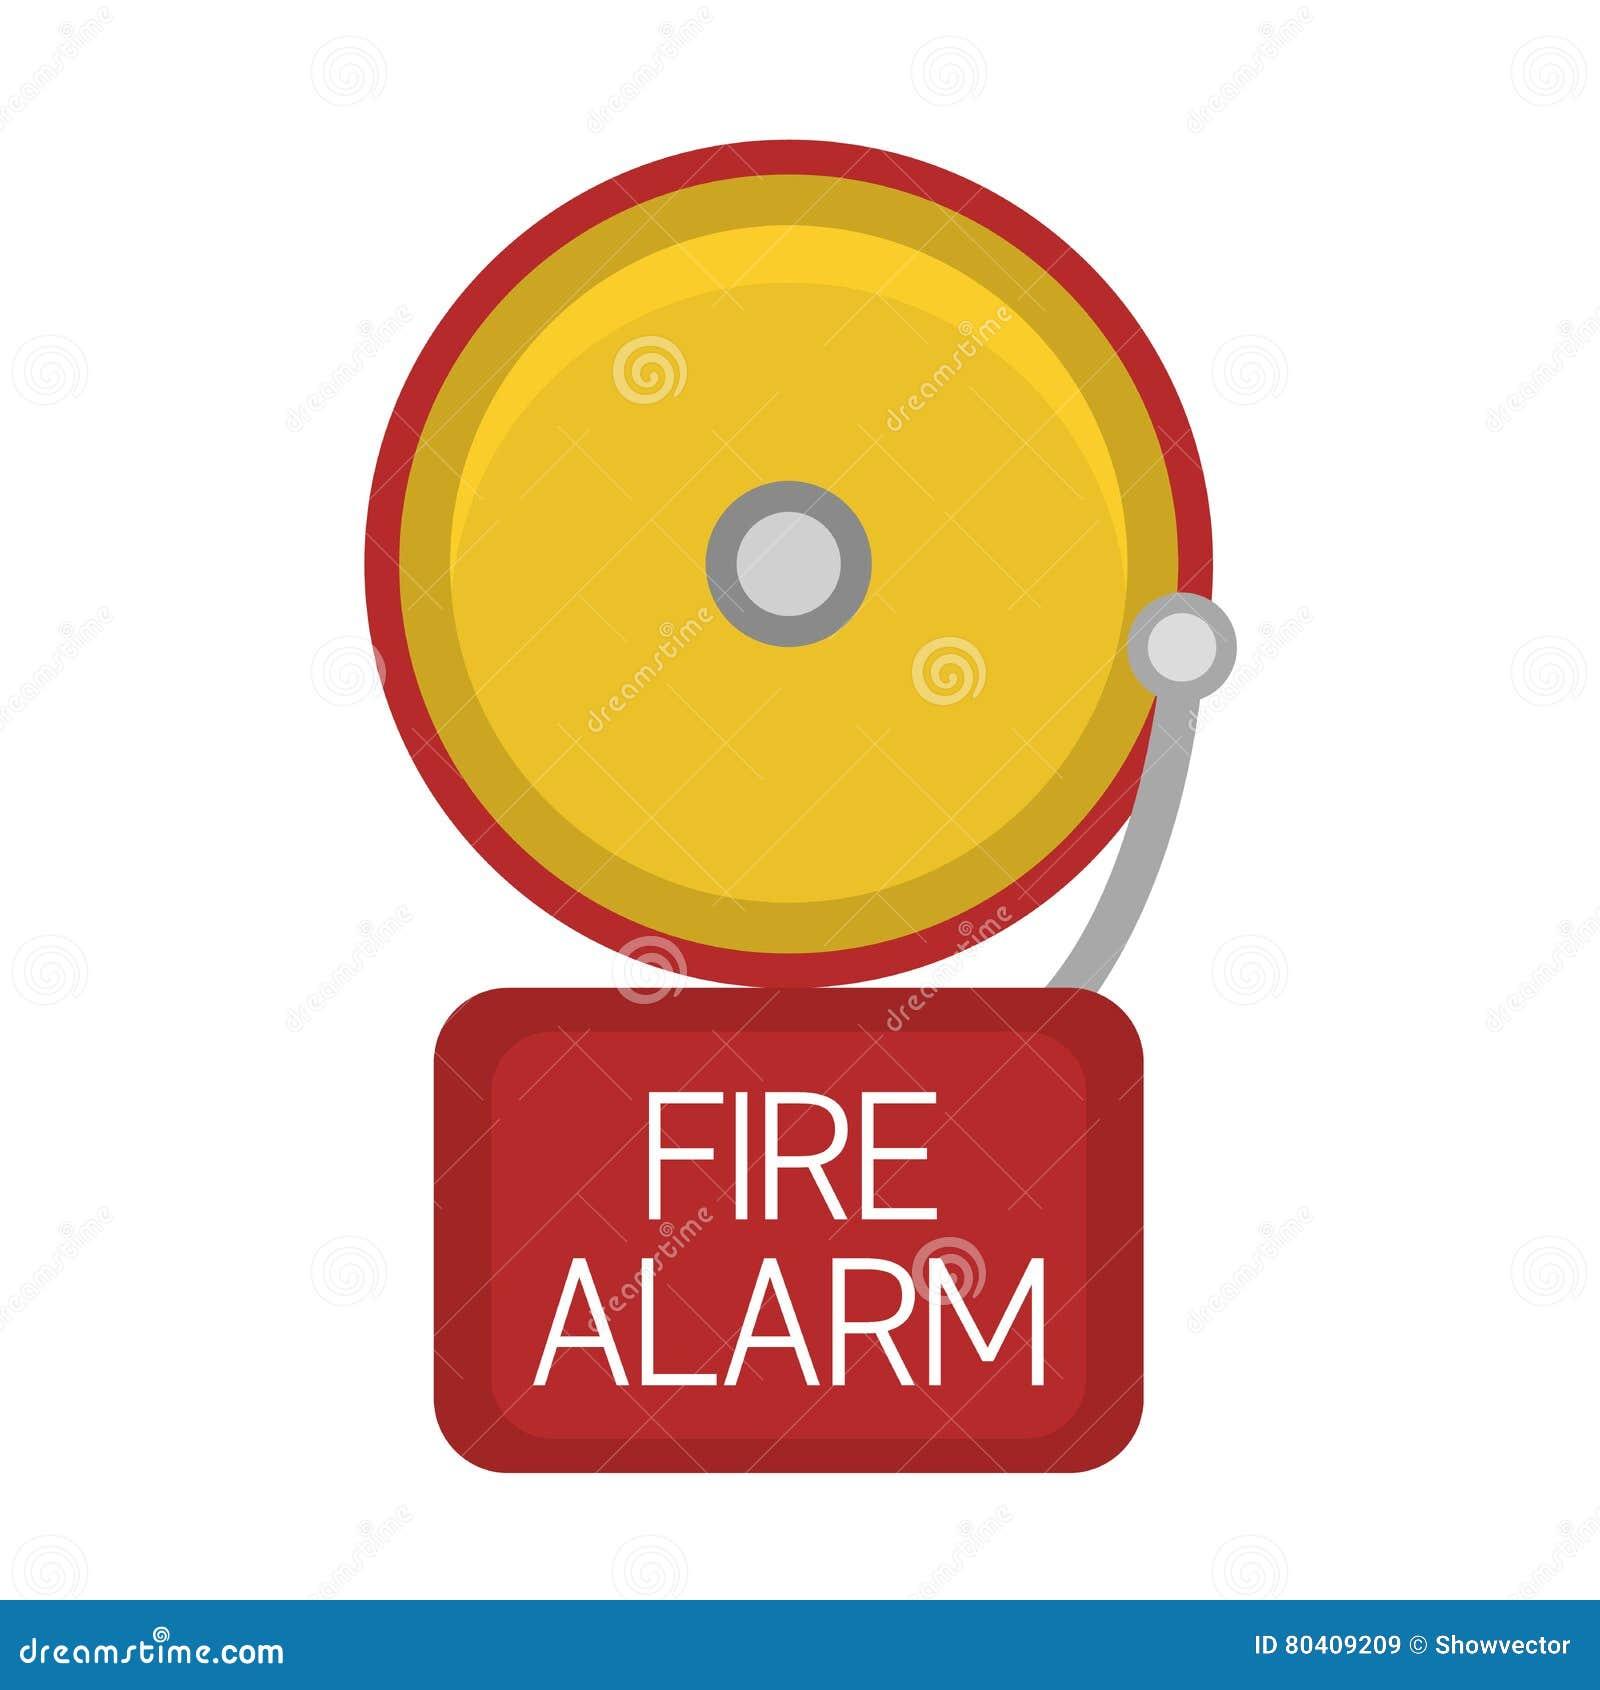 Fire Sprinkler Systems & Services